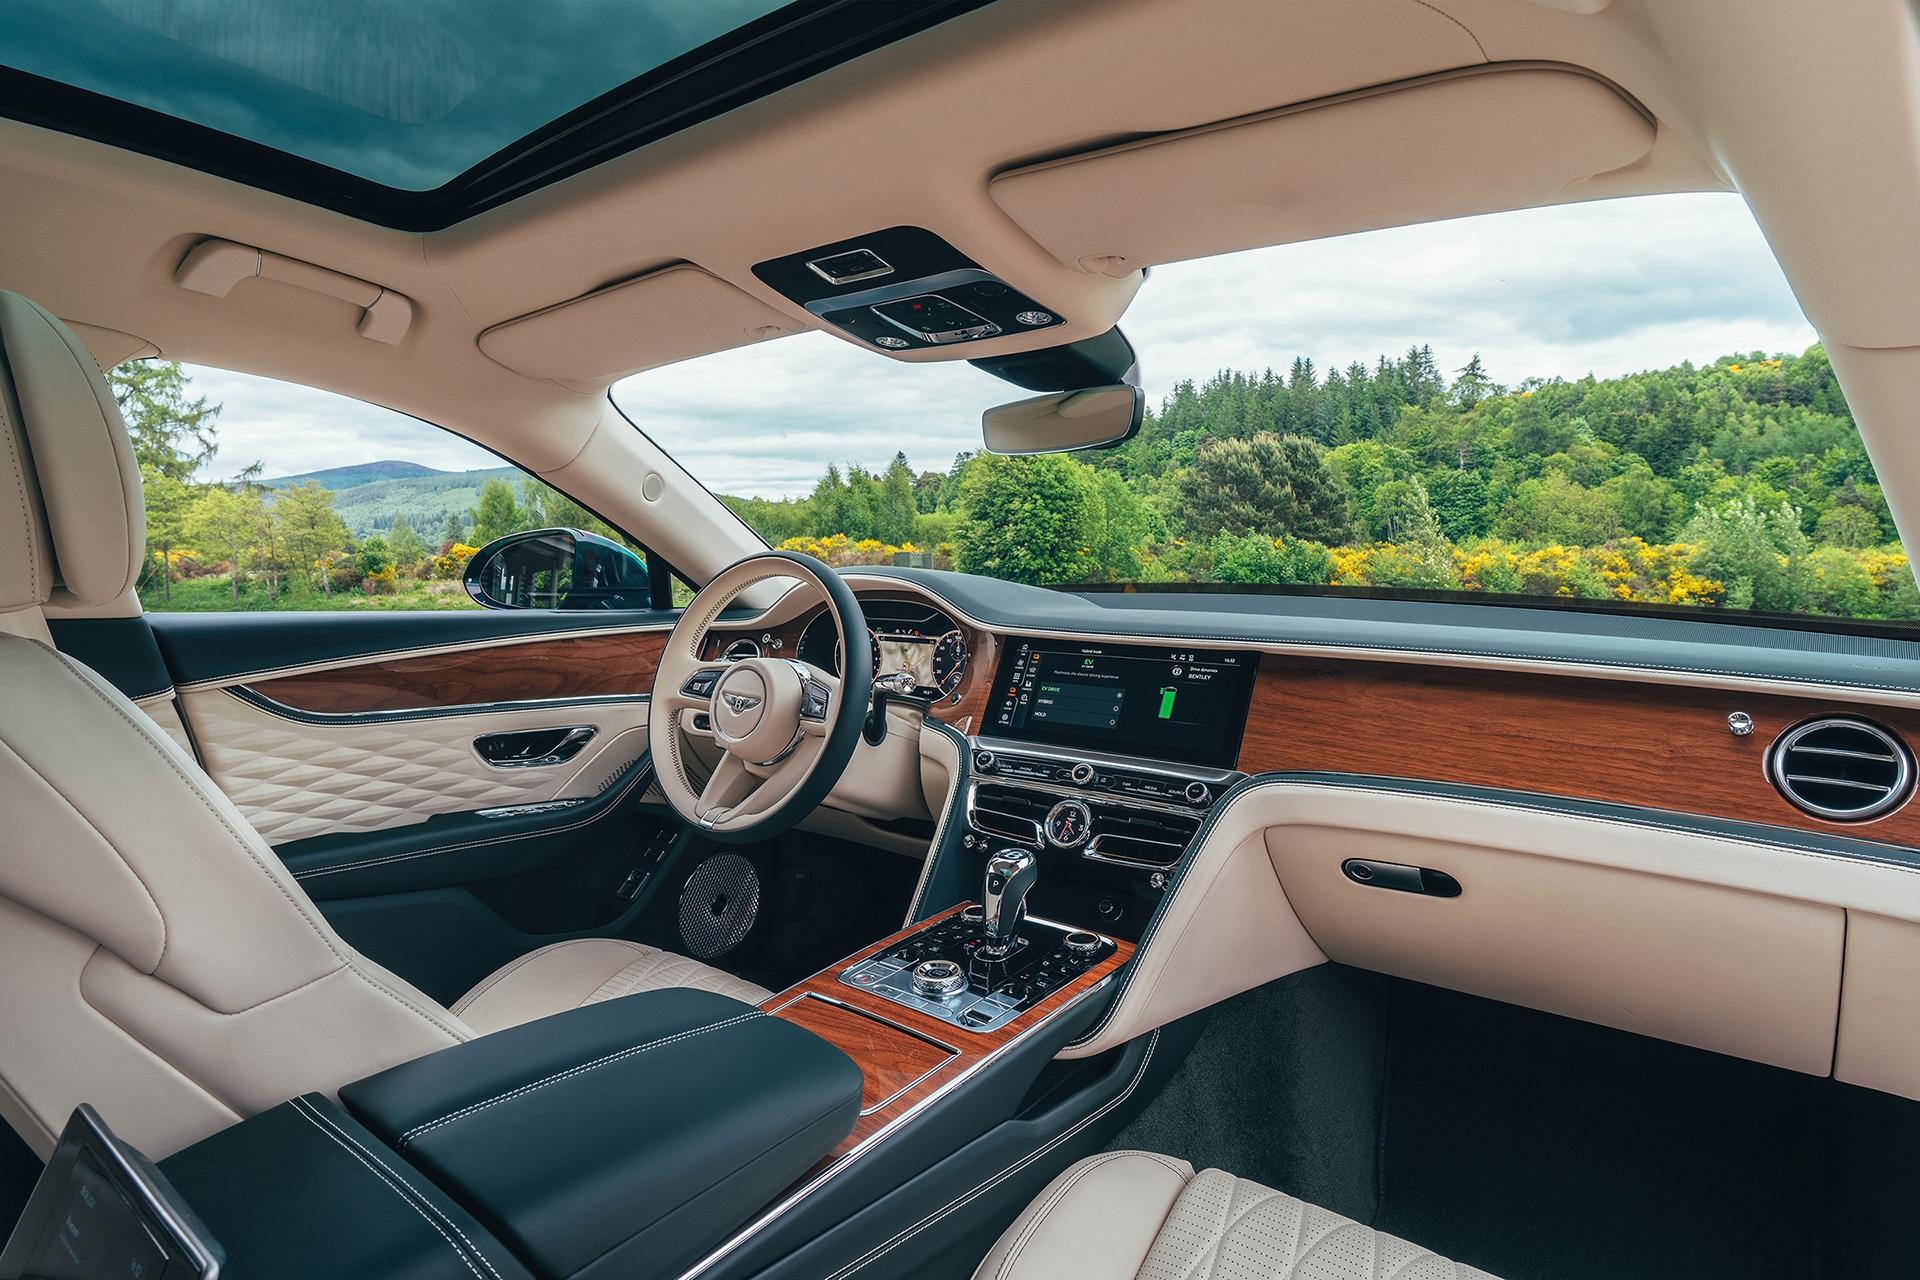 BENTLEY Flying Spur Hybrid 7 ΝΕΑ FLYING SPUR HYBRID : Ακόμα μία πράσινη Bentley Bentley, Bentley Flying Spur, Bentley Flying Spur Hybrid, Hybrid, ειδήσεις, Νέα, υβριδικό